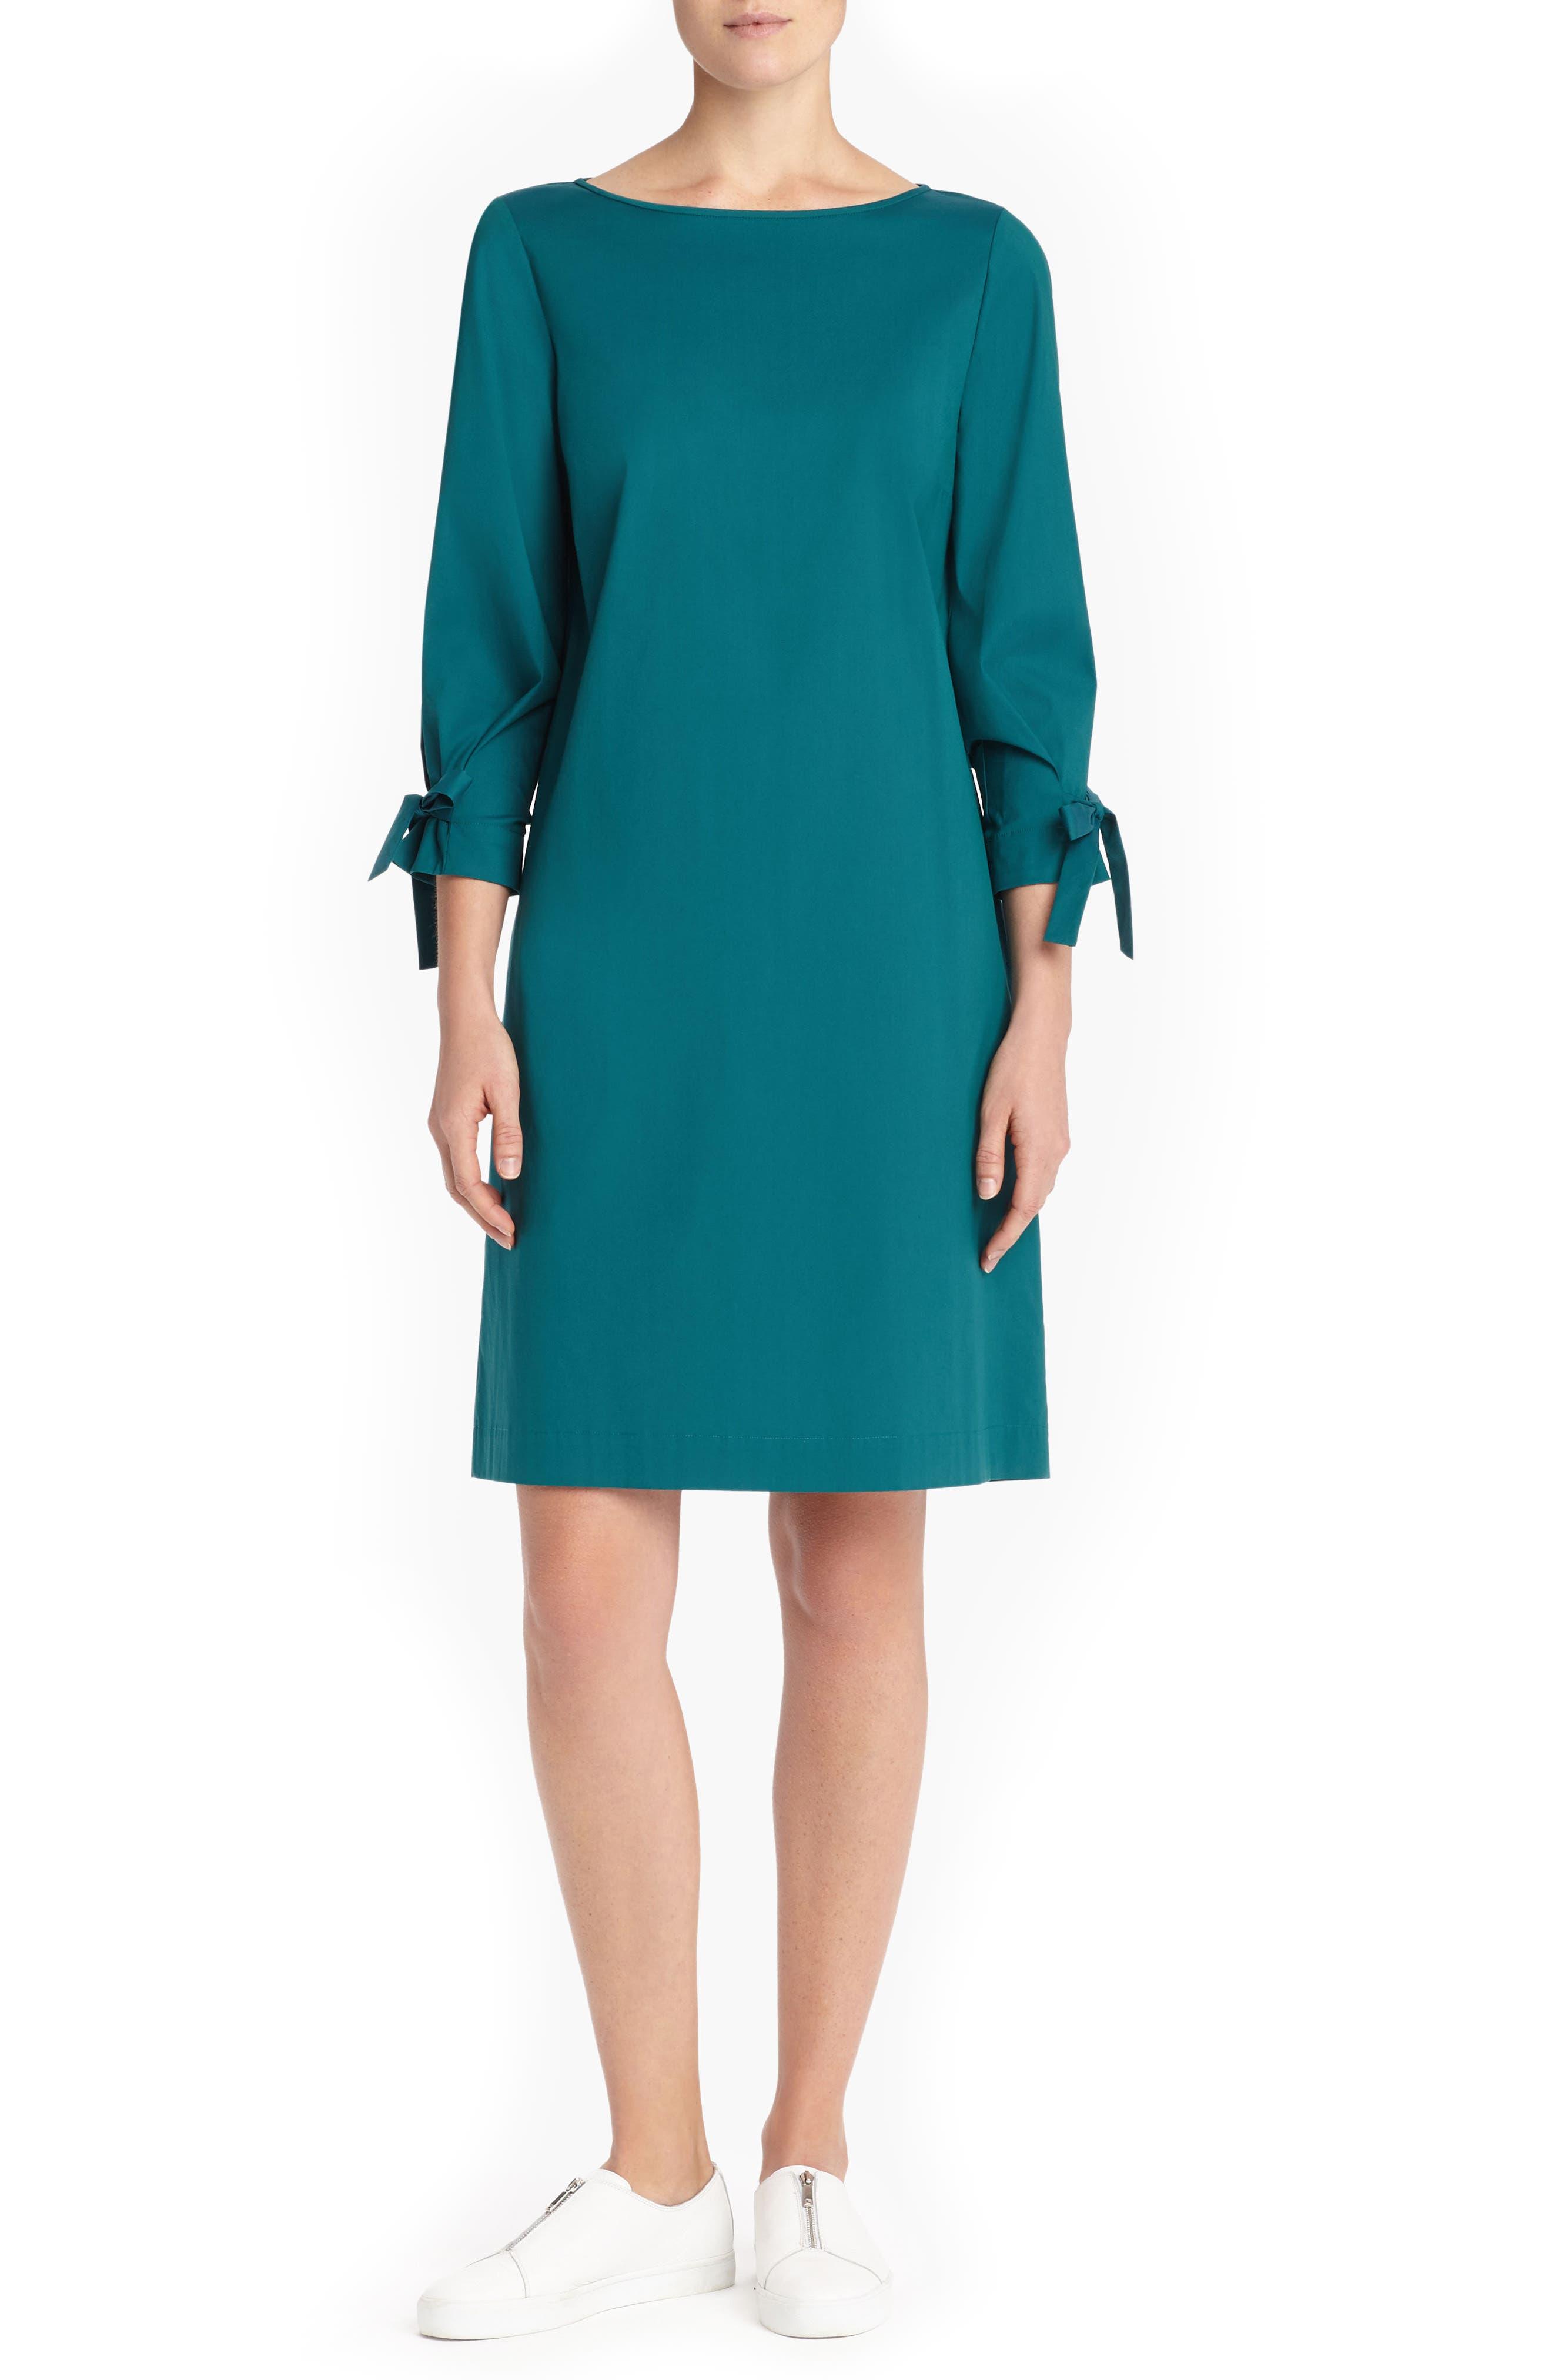 Lafayette 148 New York Paige Cotton Blend Dress, Size Petite - Blue/green